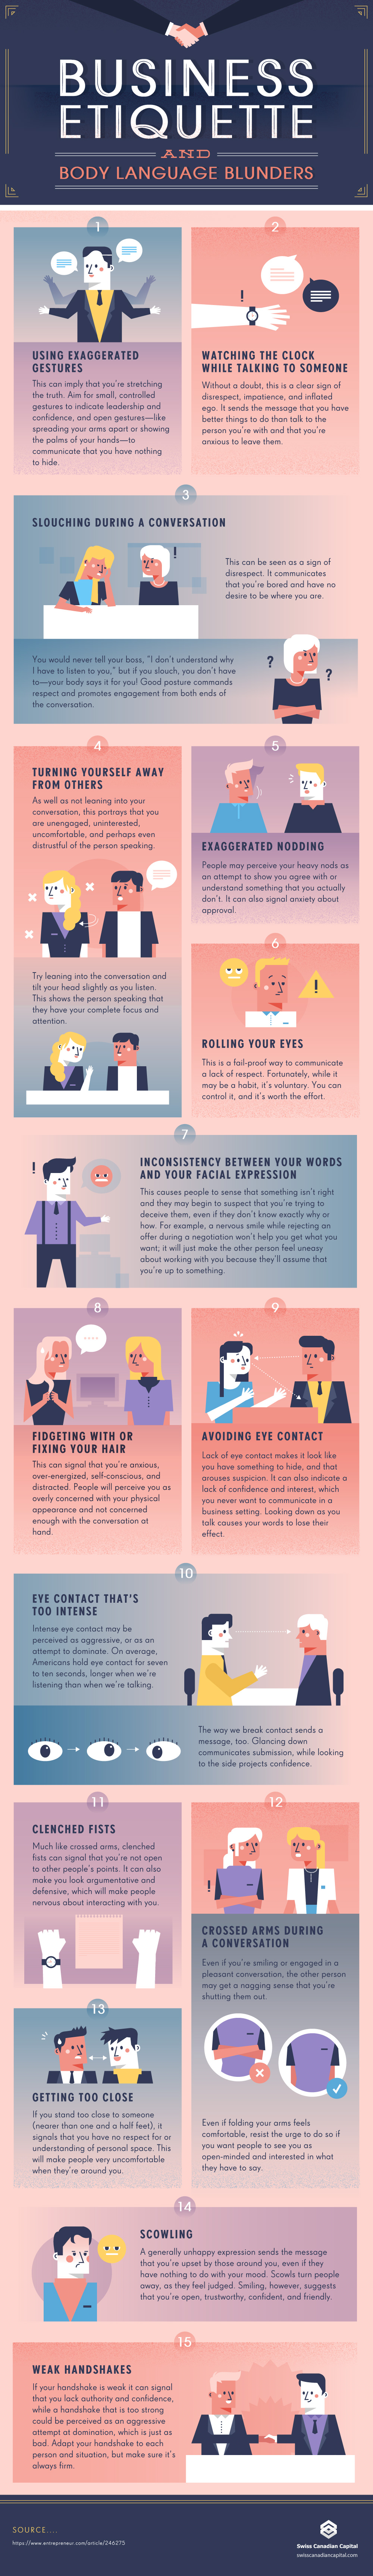 Business-Etiquette.jpg